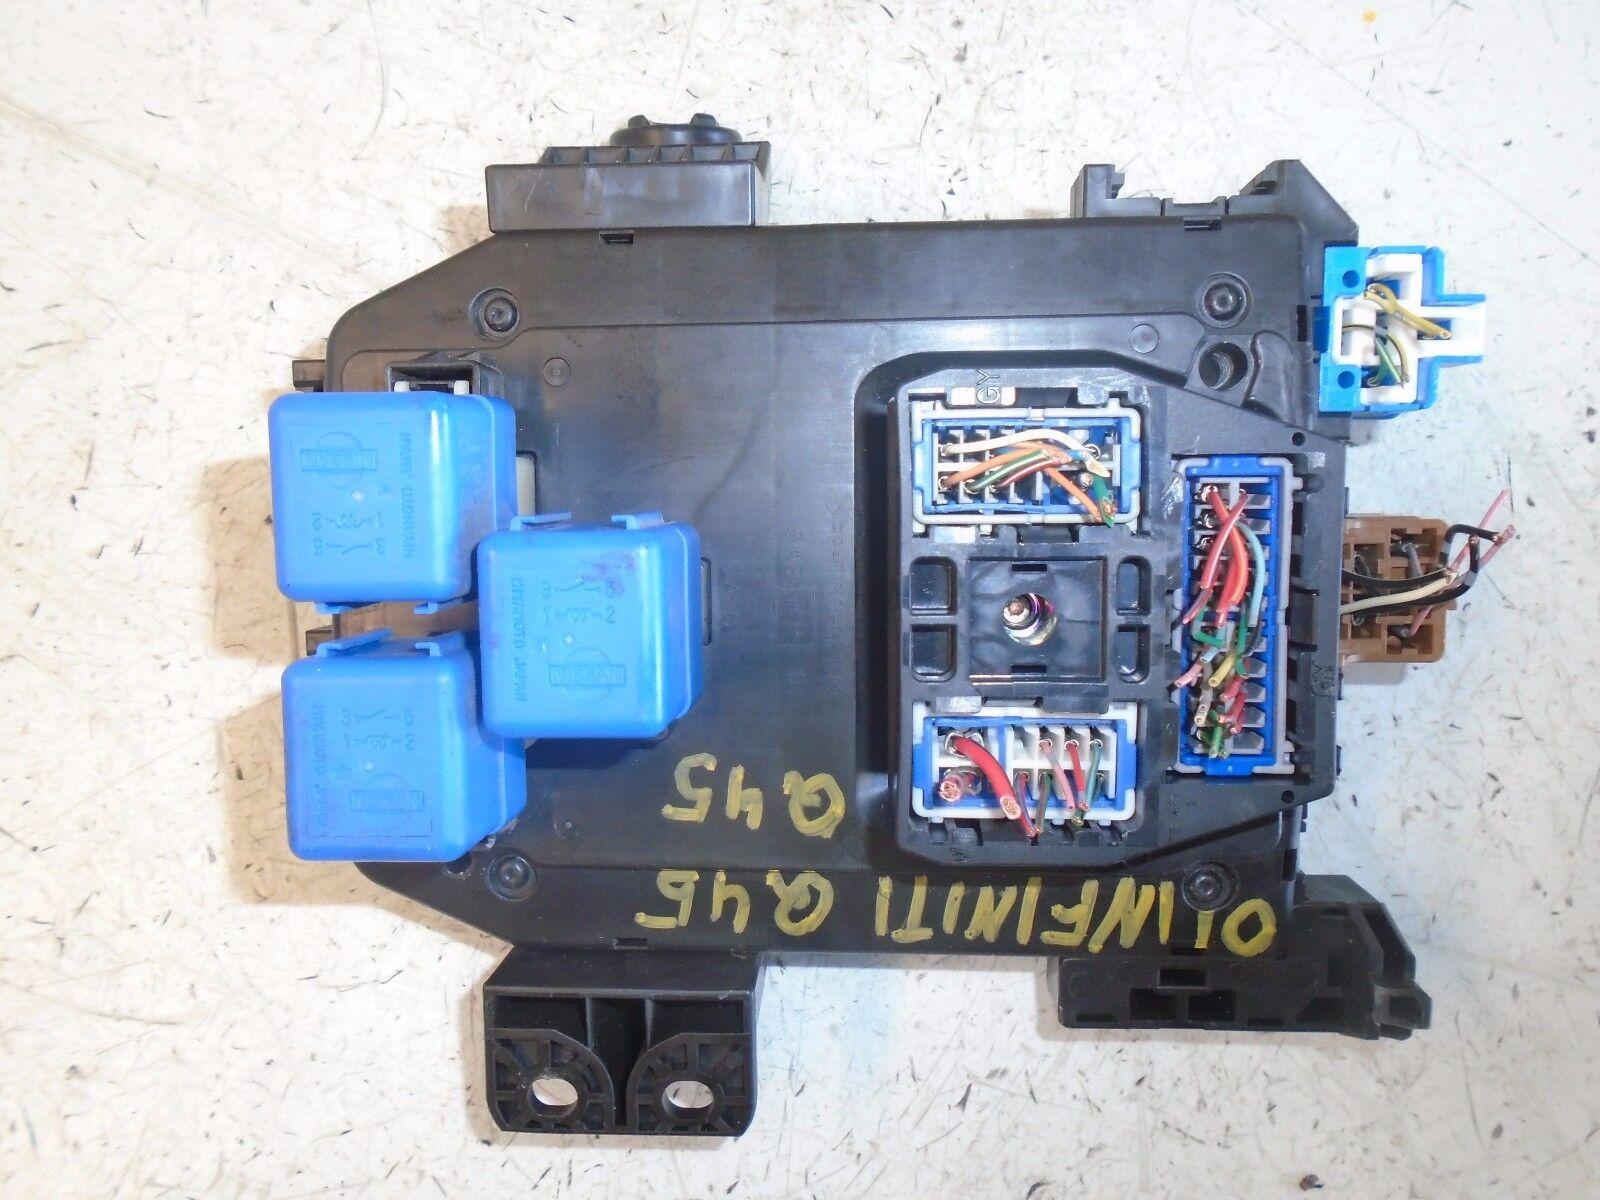 92 infiniti q45 fuse box wiring diagrams lol92 infiniti q45 fuse box wiring library 1992 infiniti [ 1600 x 1200 Pixel ]